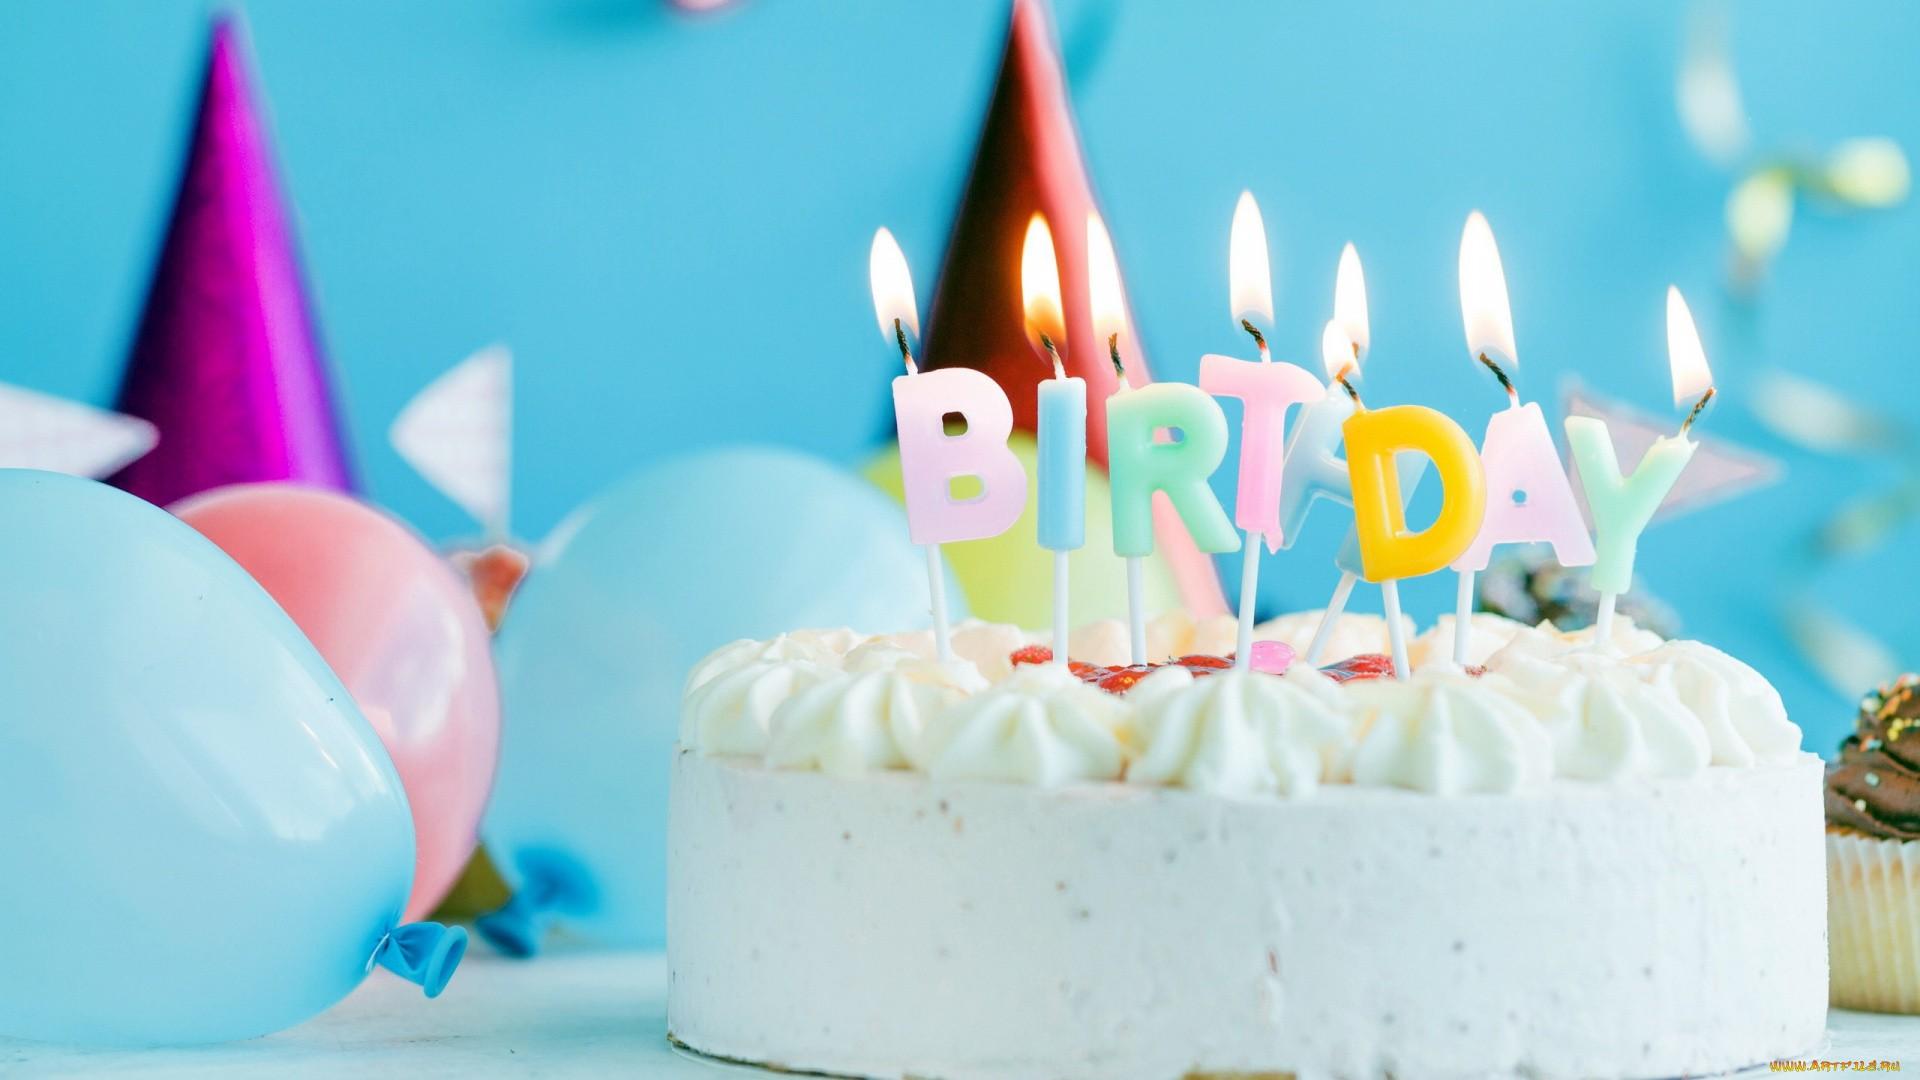 Birthday Cake background wallpaper